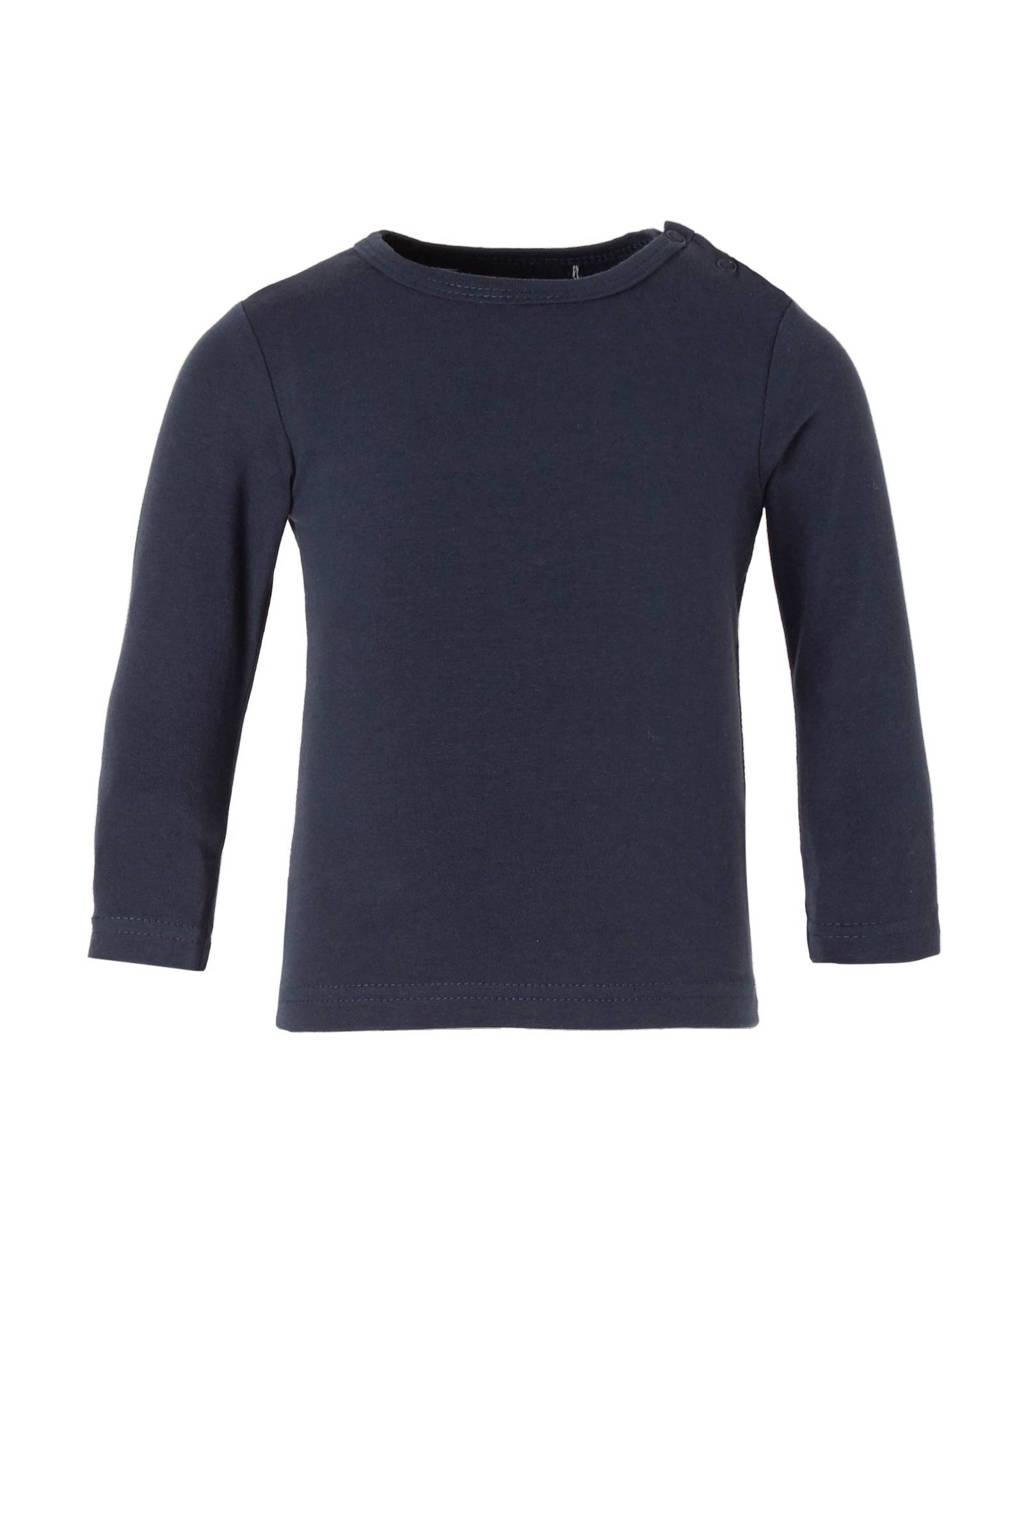 Dirkje T-shirt, Donkerblauw, Lang